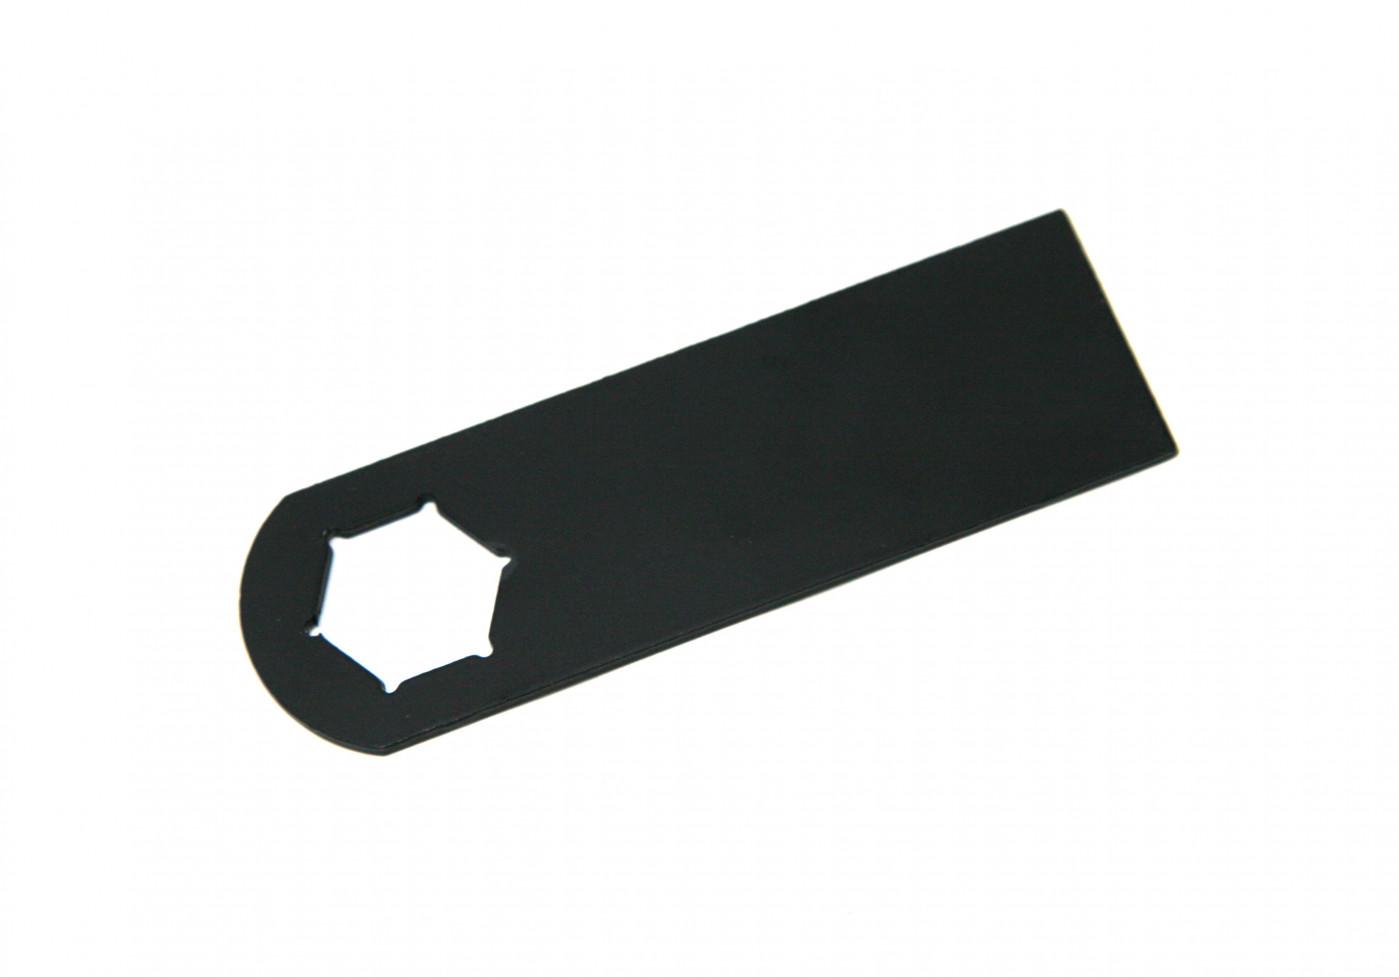 Nůž vertikutátor KYNAST - 110.004.065